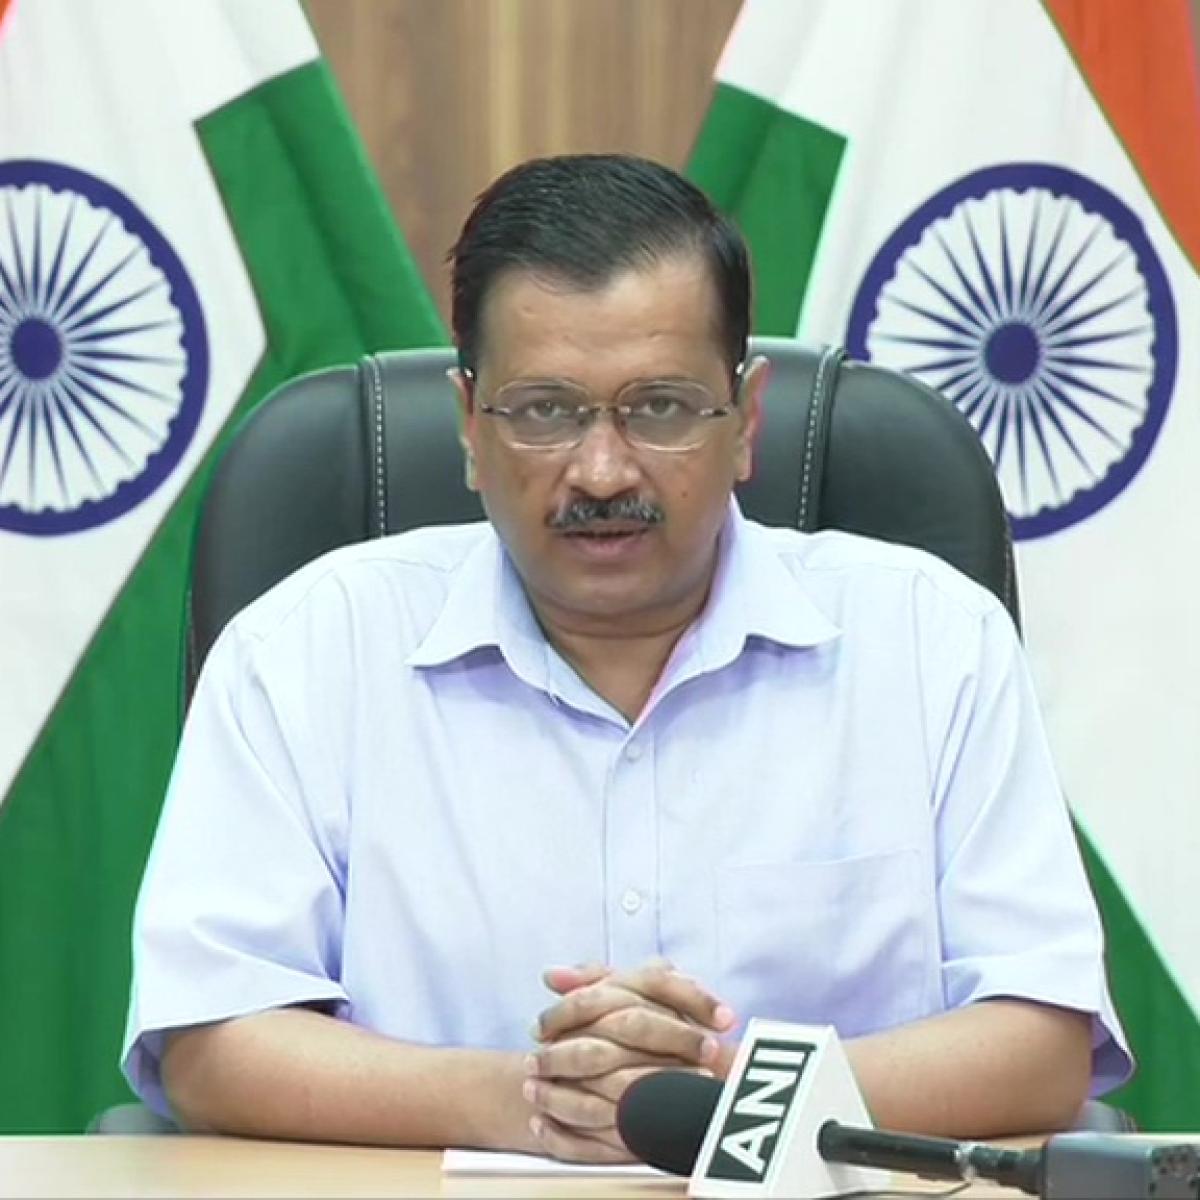 COVID-19 lockdown in Delhi extended by a week till May 3: CM Arvind Kejriwal